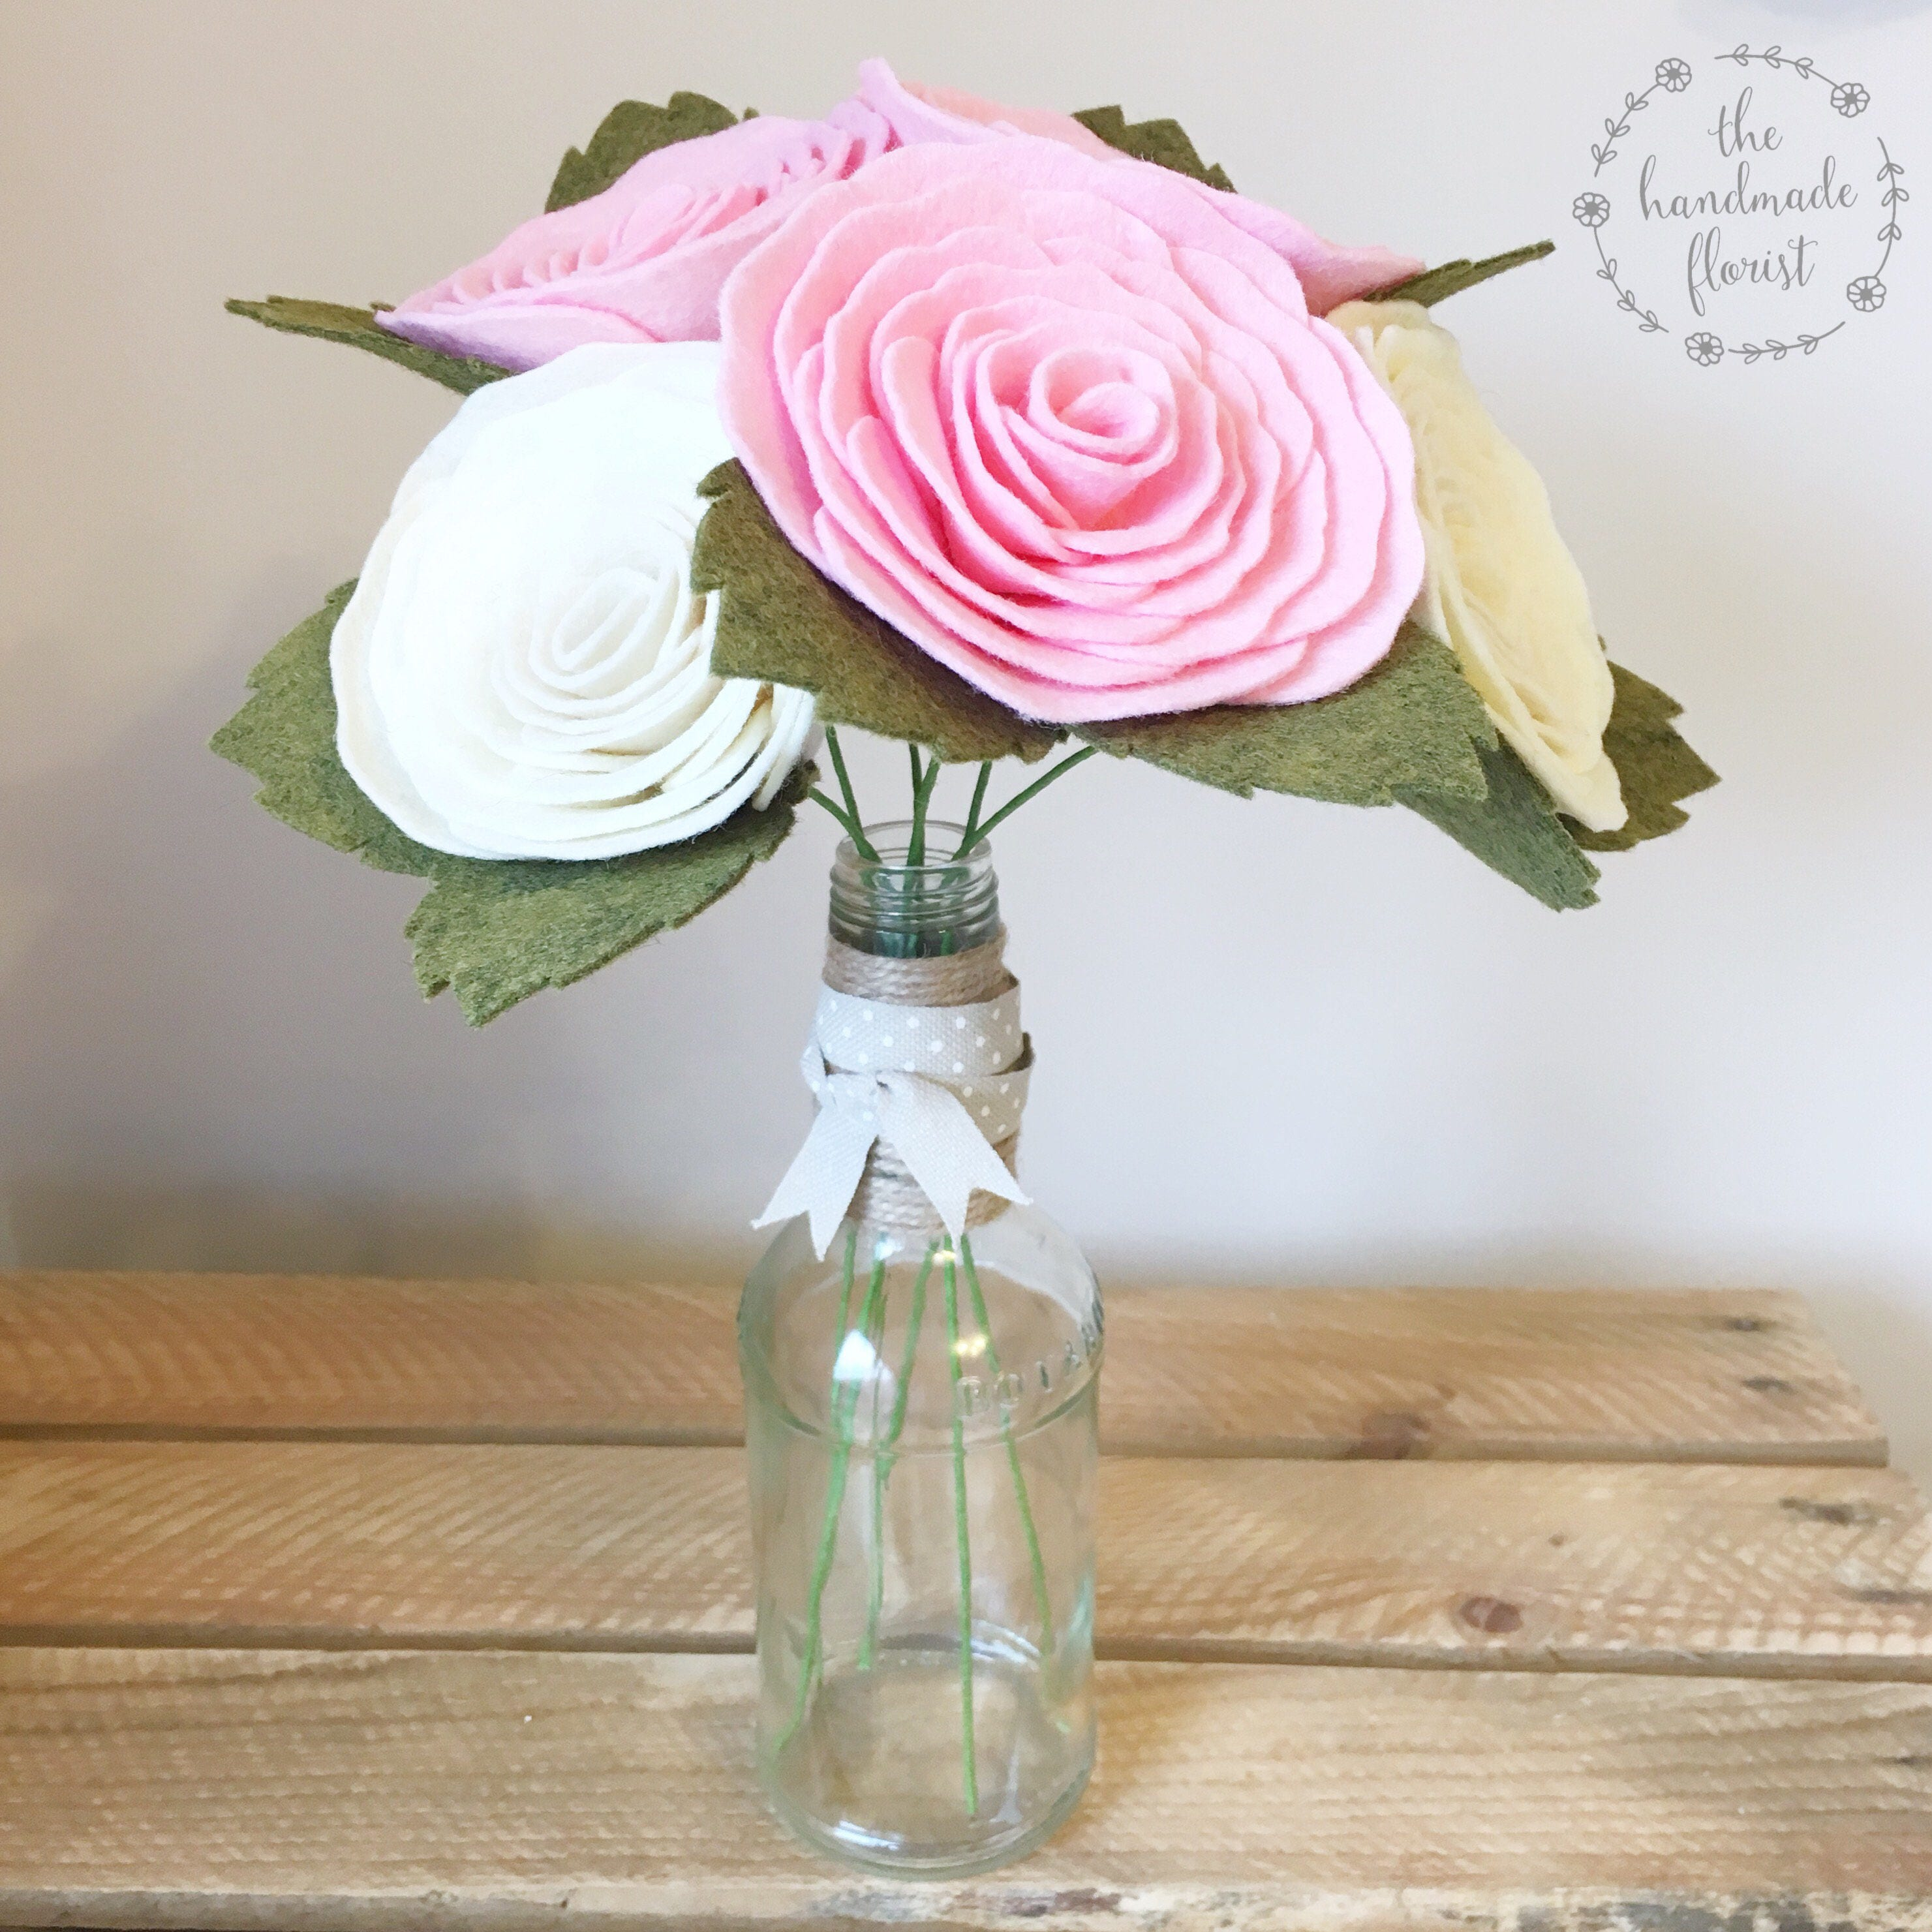 Pdf tutorial diy felt flowers spiralling rose bouquet no etsy zoom izmirmasajfo